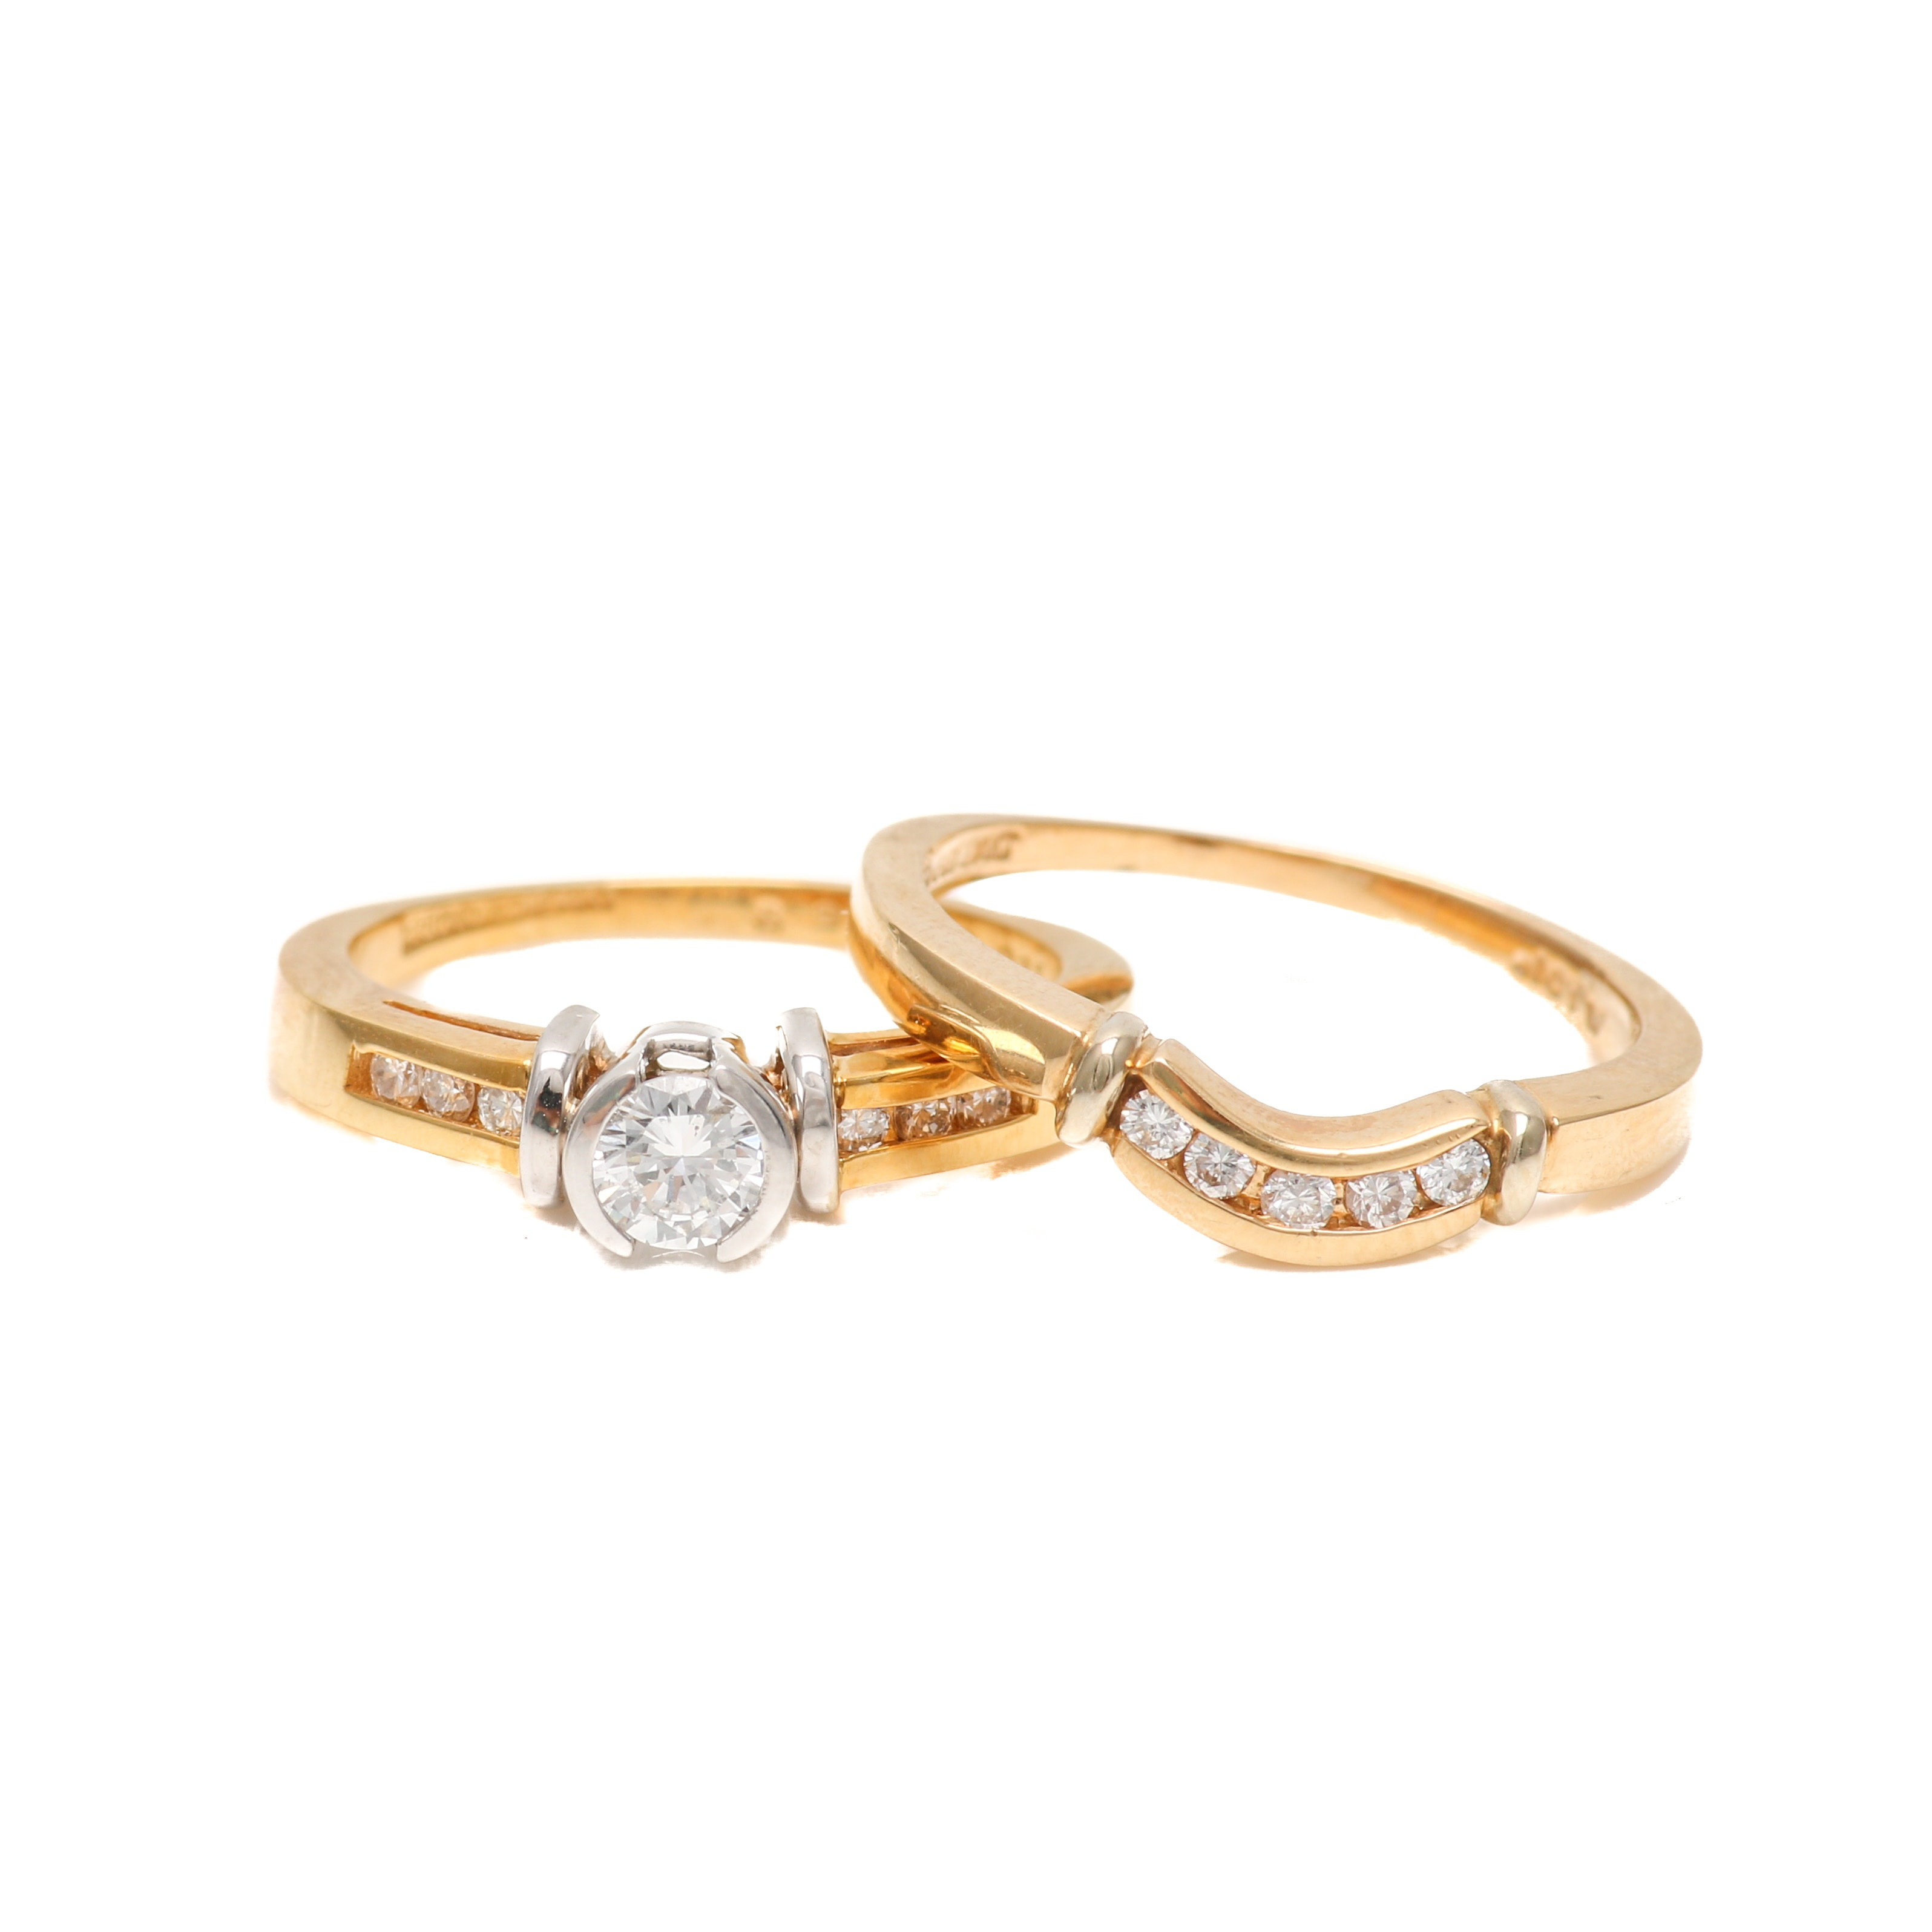 14K Two Tone Gold Diamond Ring Set